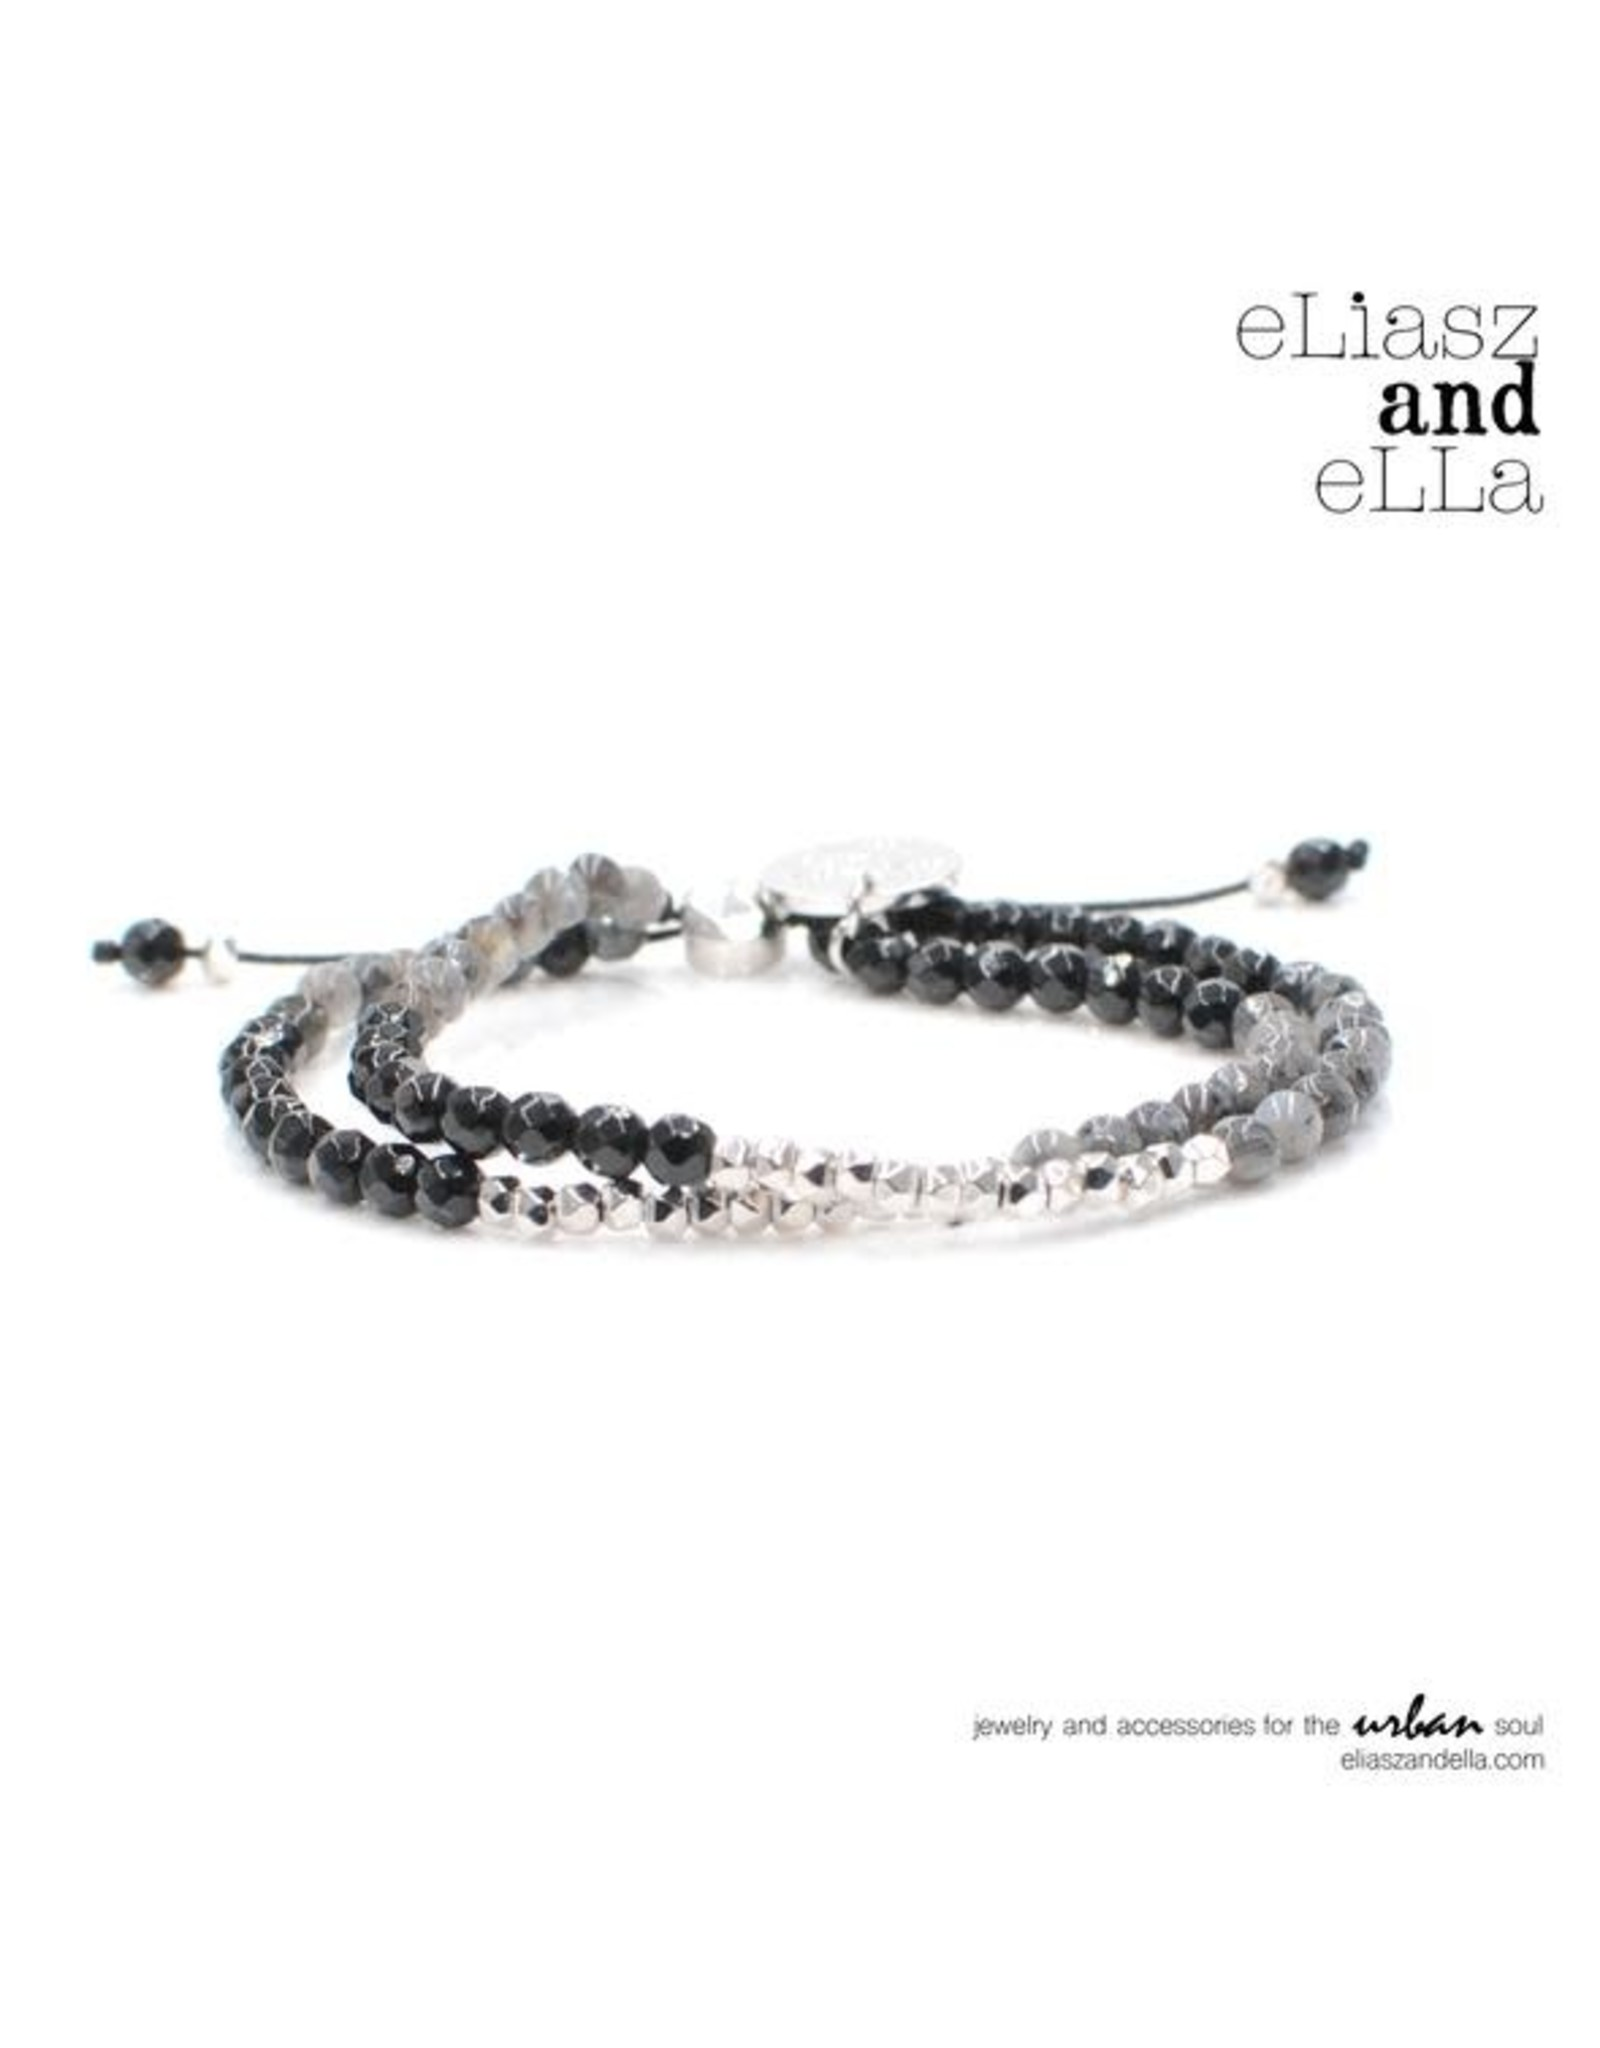 "eLiasz and eLLa ""Marquis"" Mixbead Stone Bangin' Bracelet"